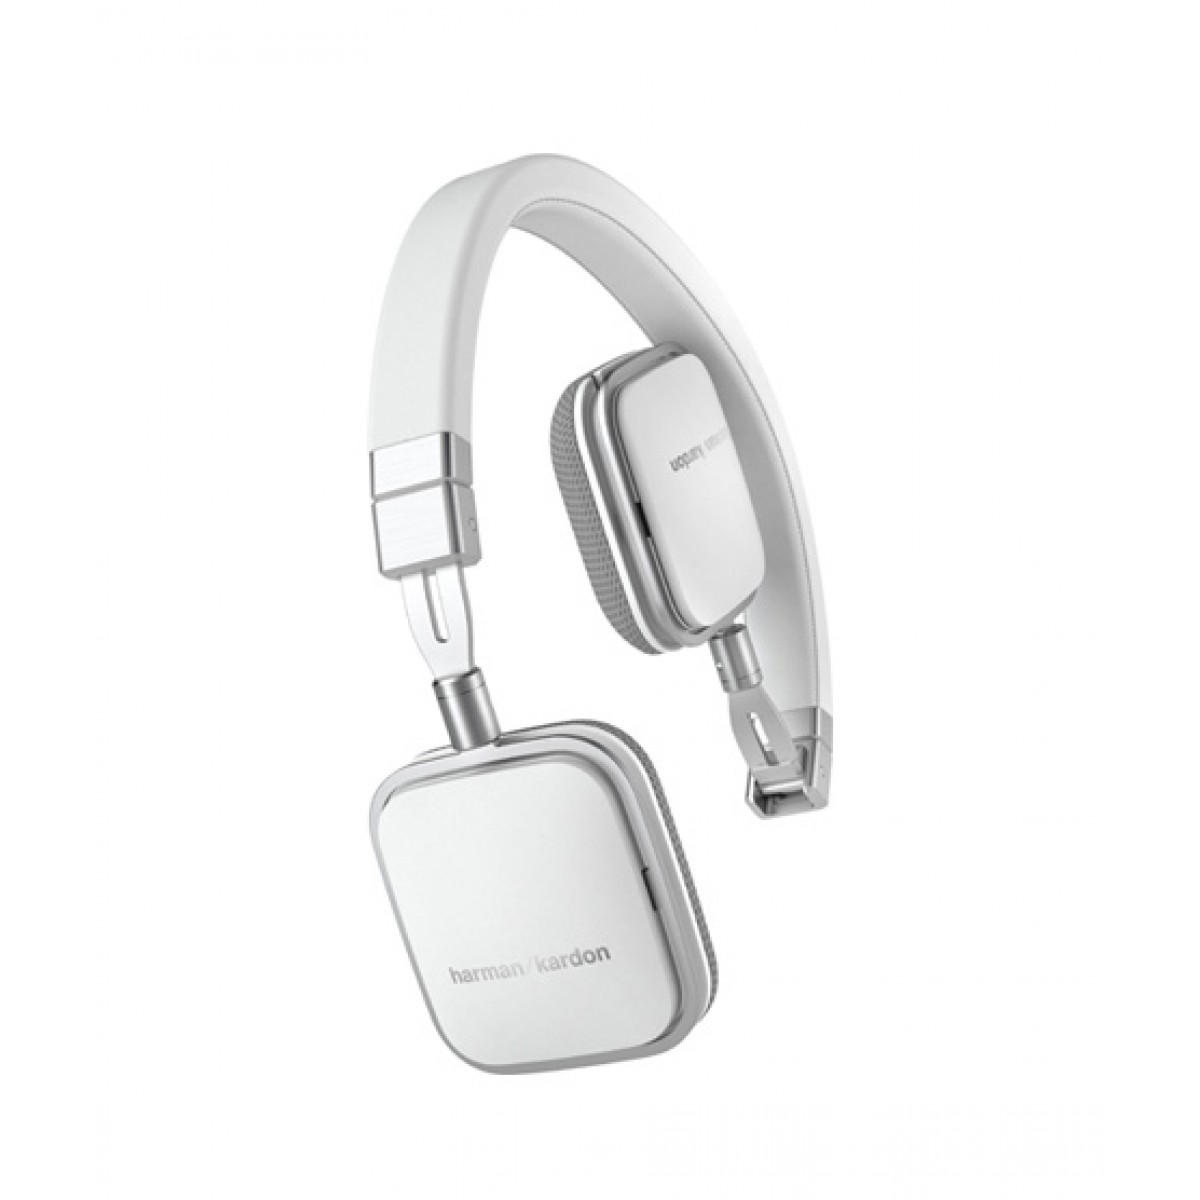 cac220d95cc Harman Kardon Soho-I On-Ear Headphones Price in Pakistan | Buy Harman  Kardon Headphones White For iPhone | iShopping.pk